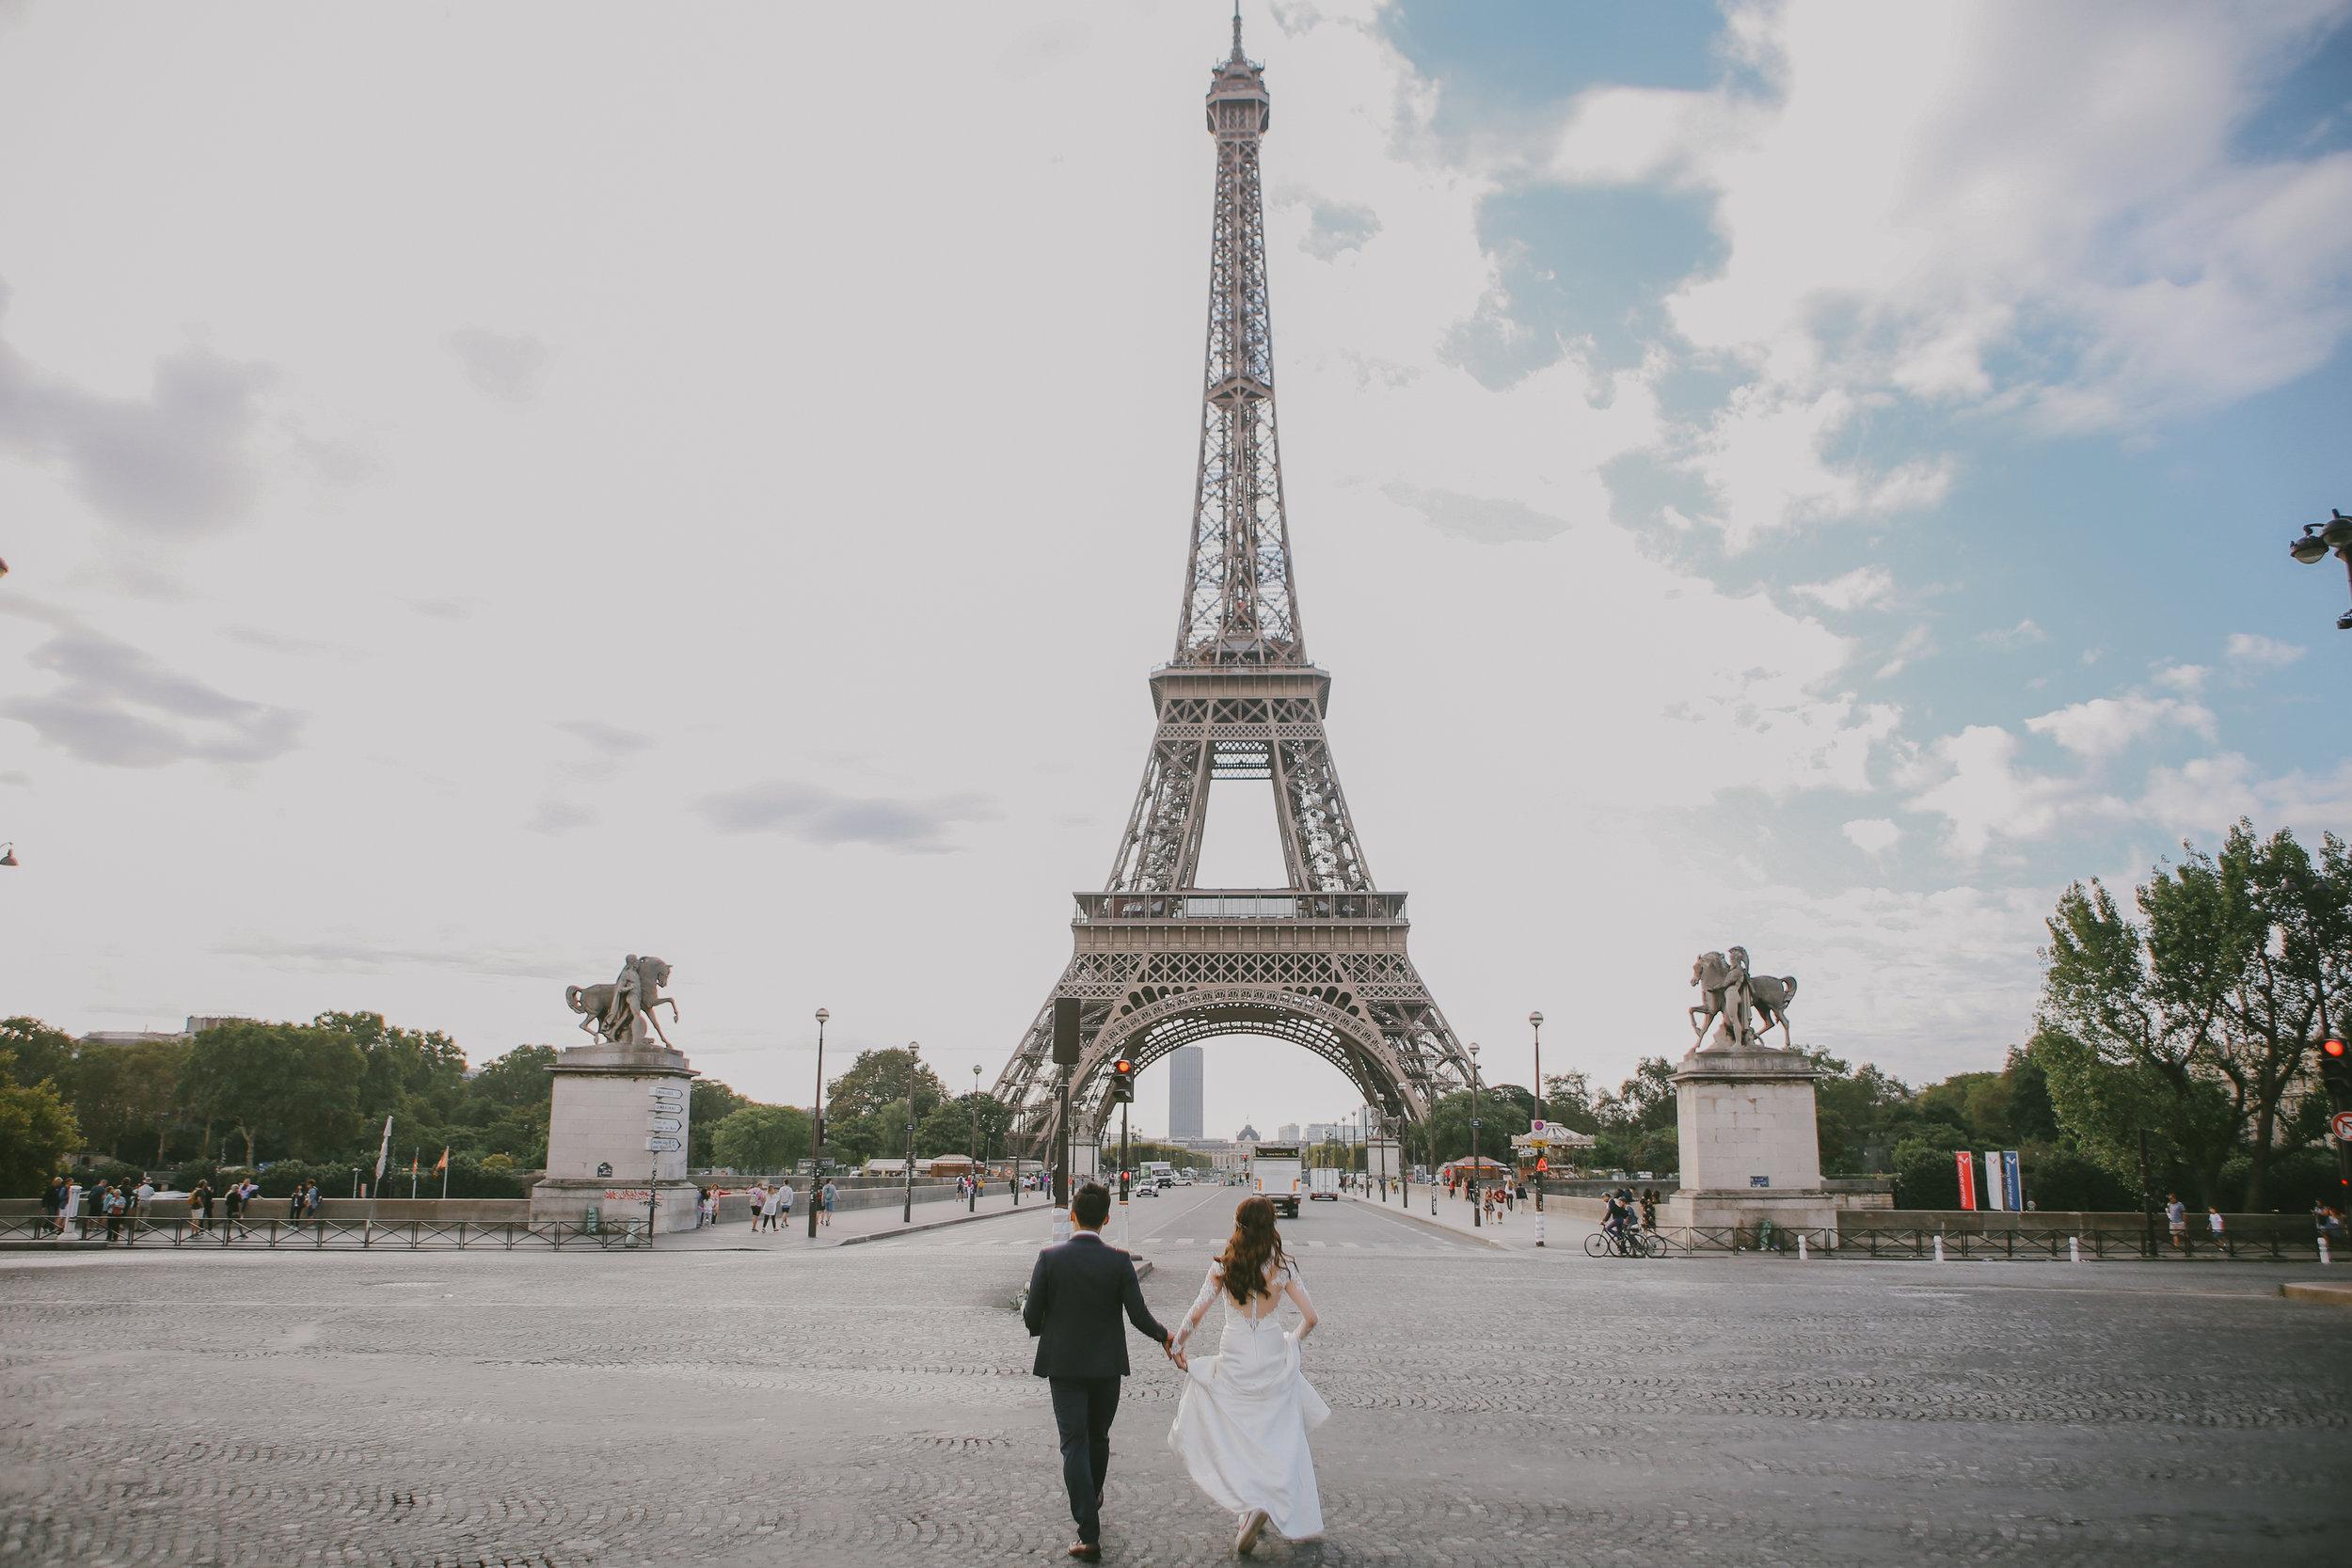 2018-pre-wedding-studio-numb9r-paris-high-1252e.jpg